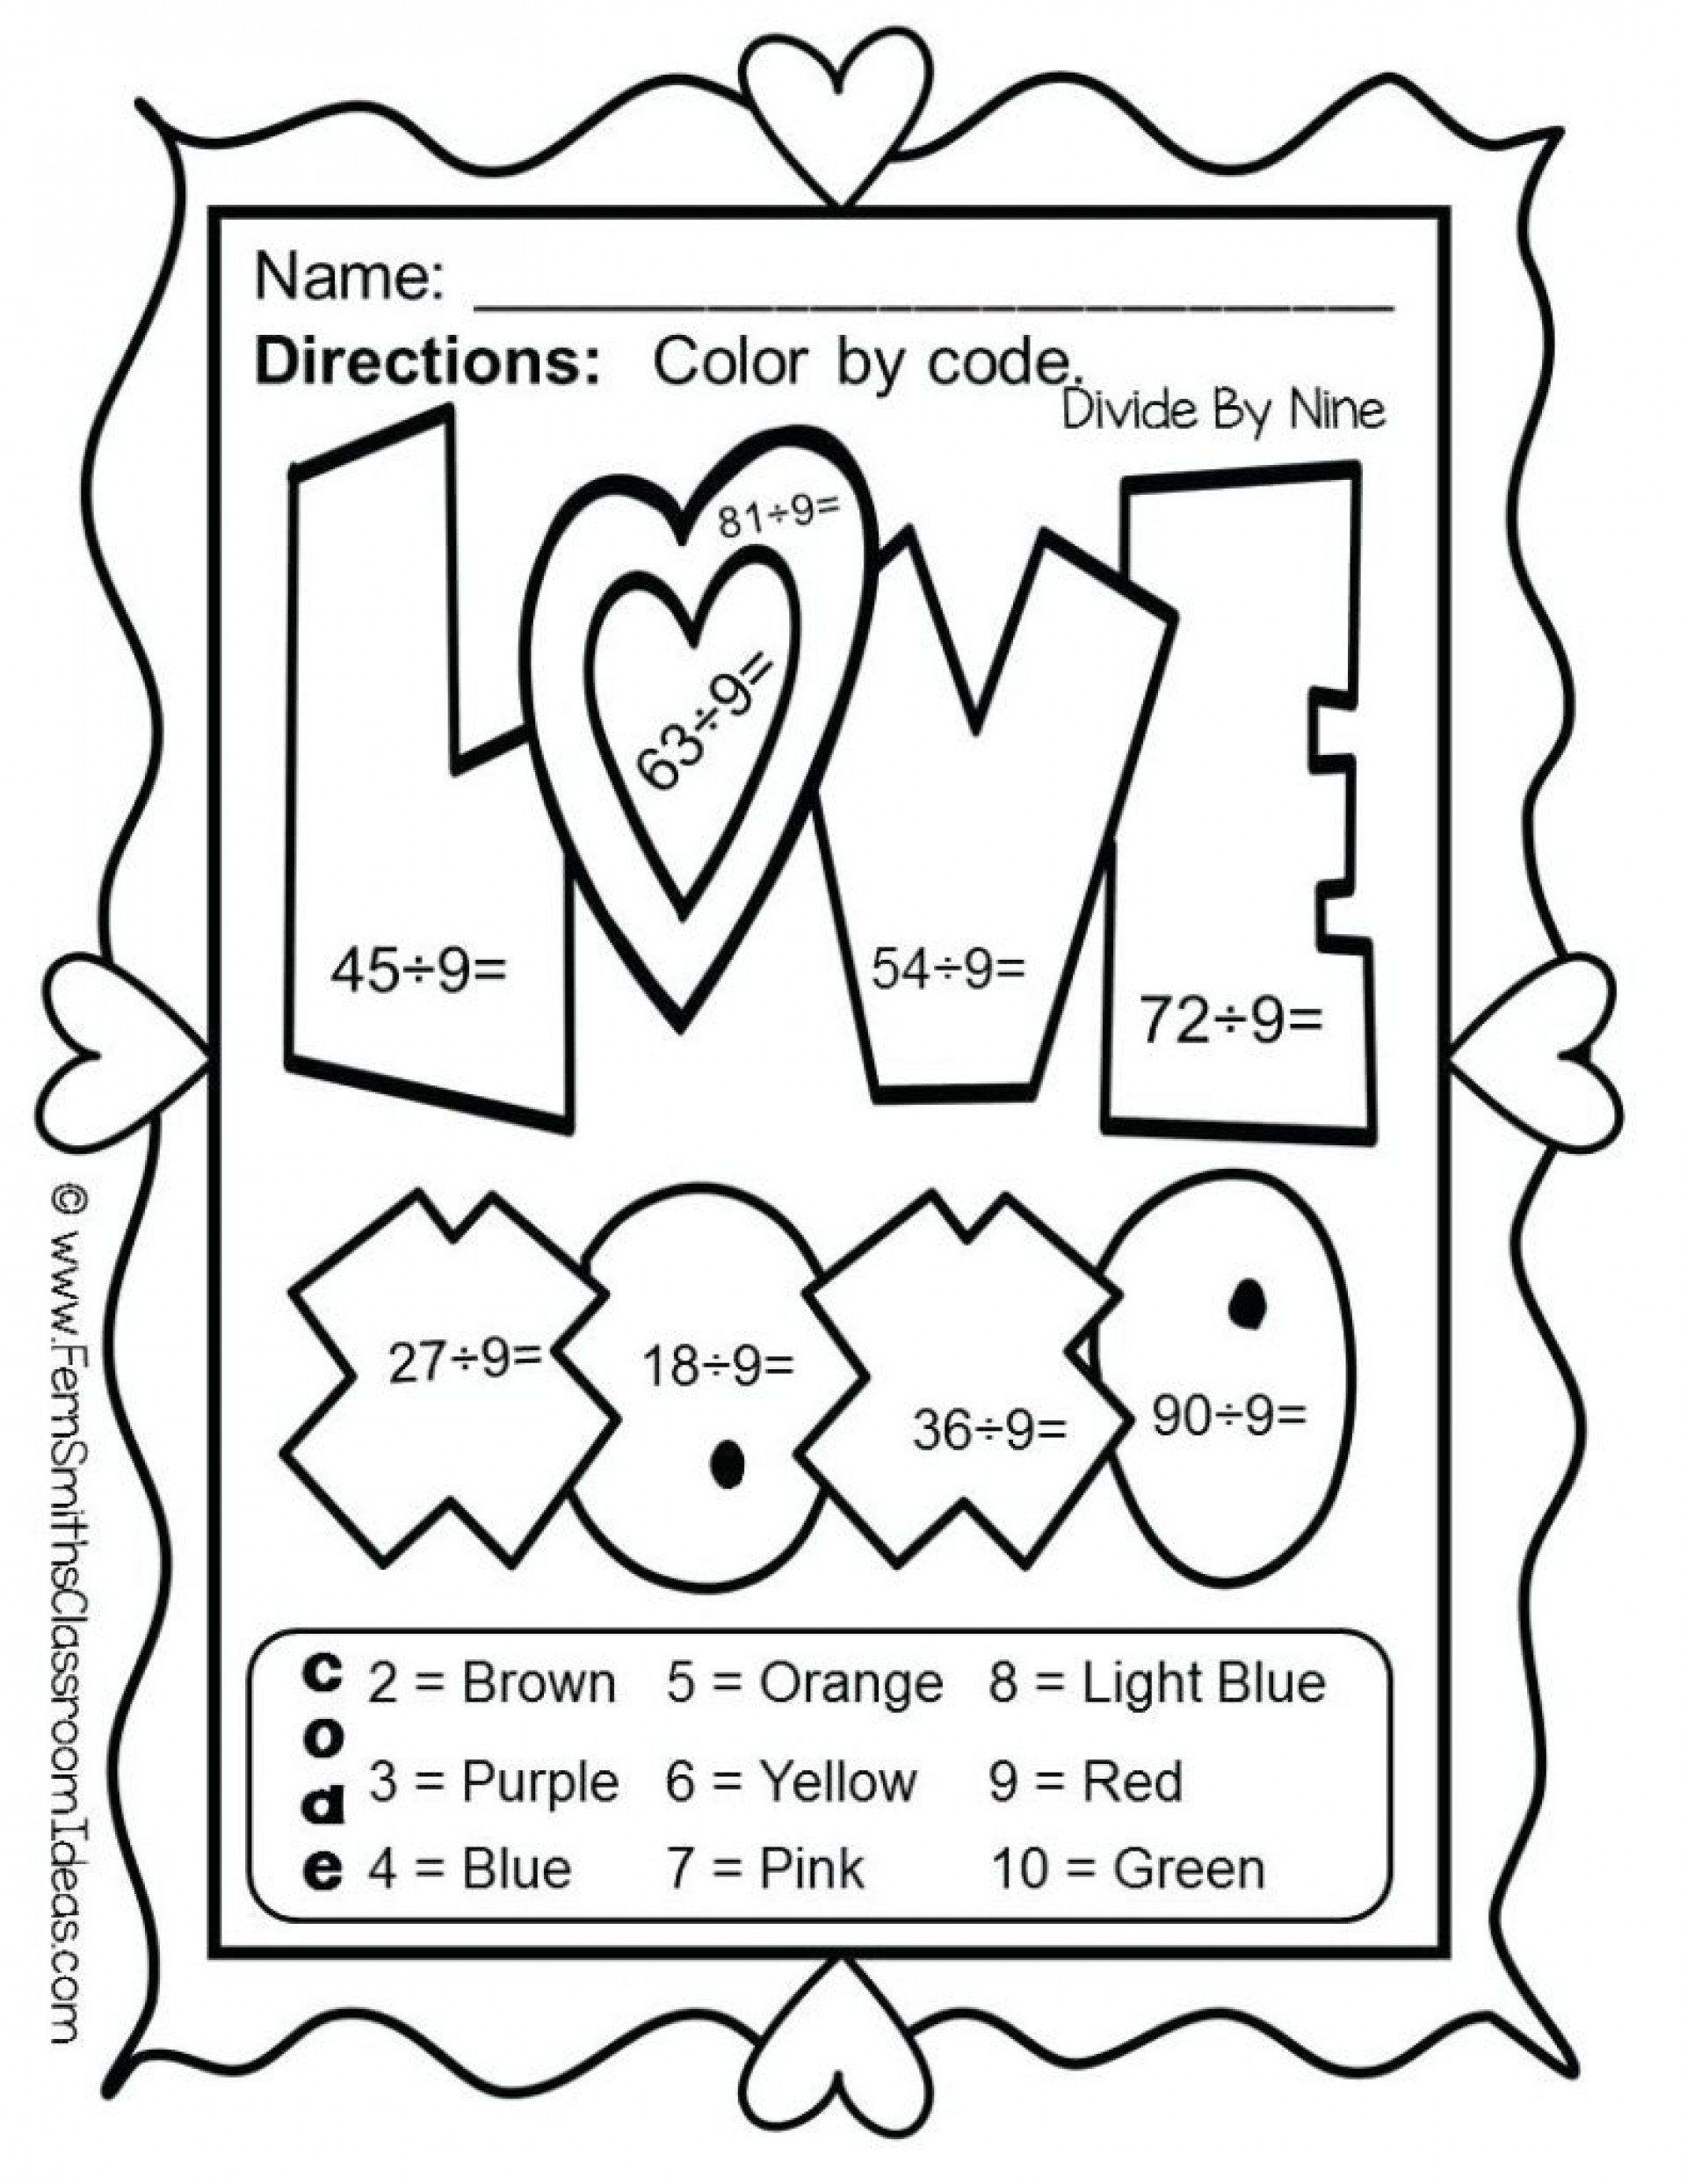 Kindergarten Place Value Worksheets Place Value To 20 Worksheet Valentine Math Worksheet Math Worksheets Free Math Worksheets Valentine addition worksheets for first